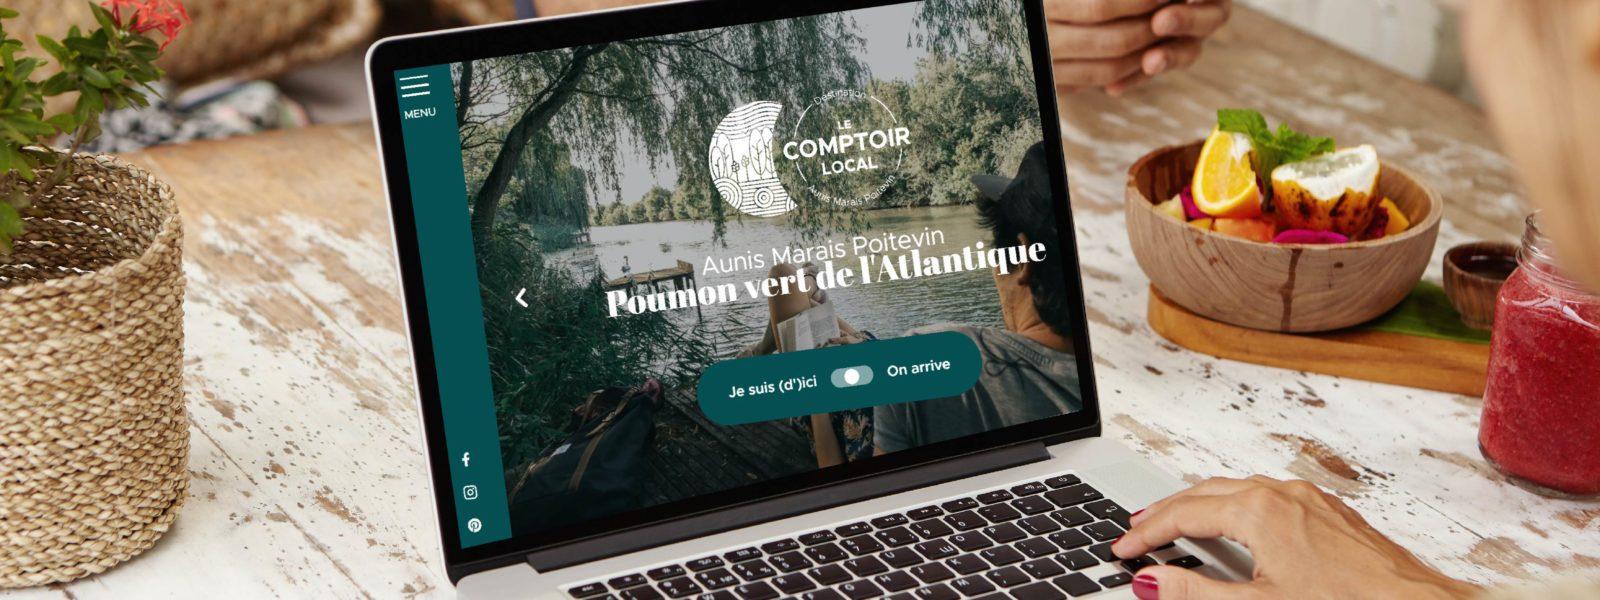 Le Comptoir local, destination Aunis Marais poitevin